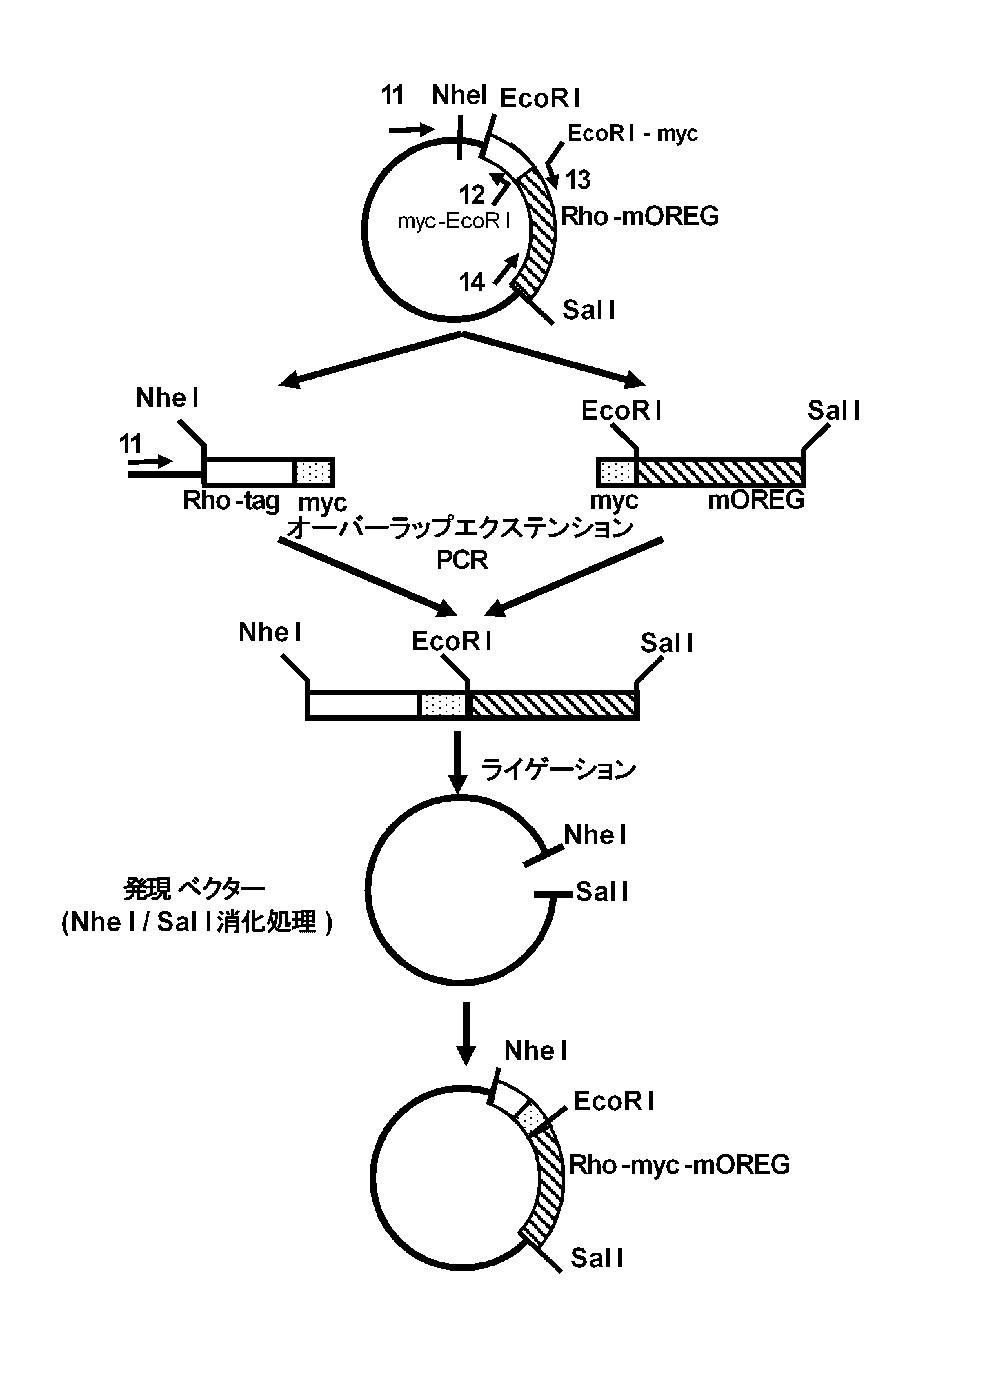 WO2012056683A1 - キメラ嗅覚受容体を用いてcAMPを産生する方法         - Google PatentsFamily